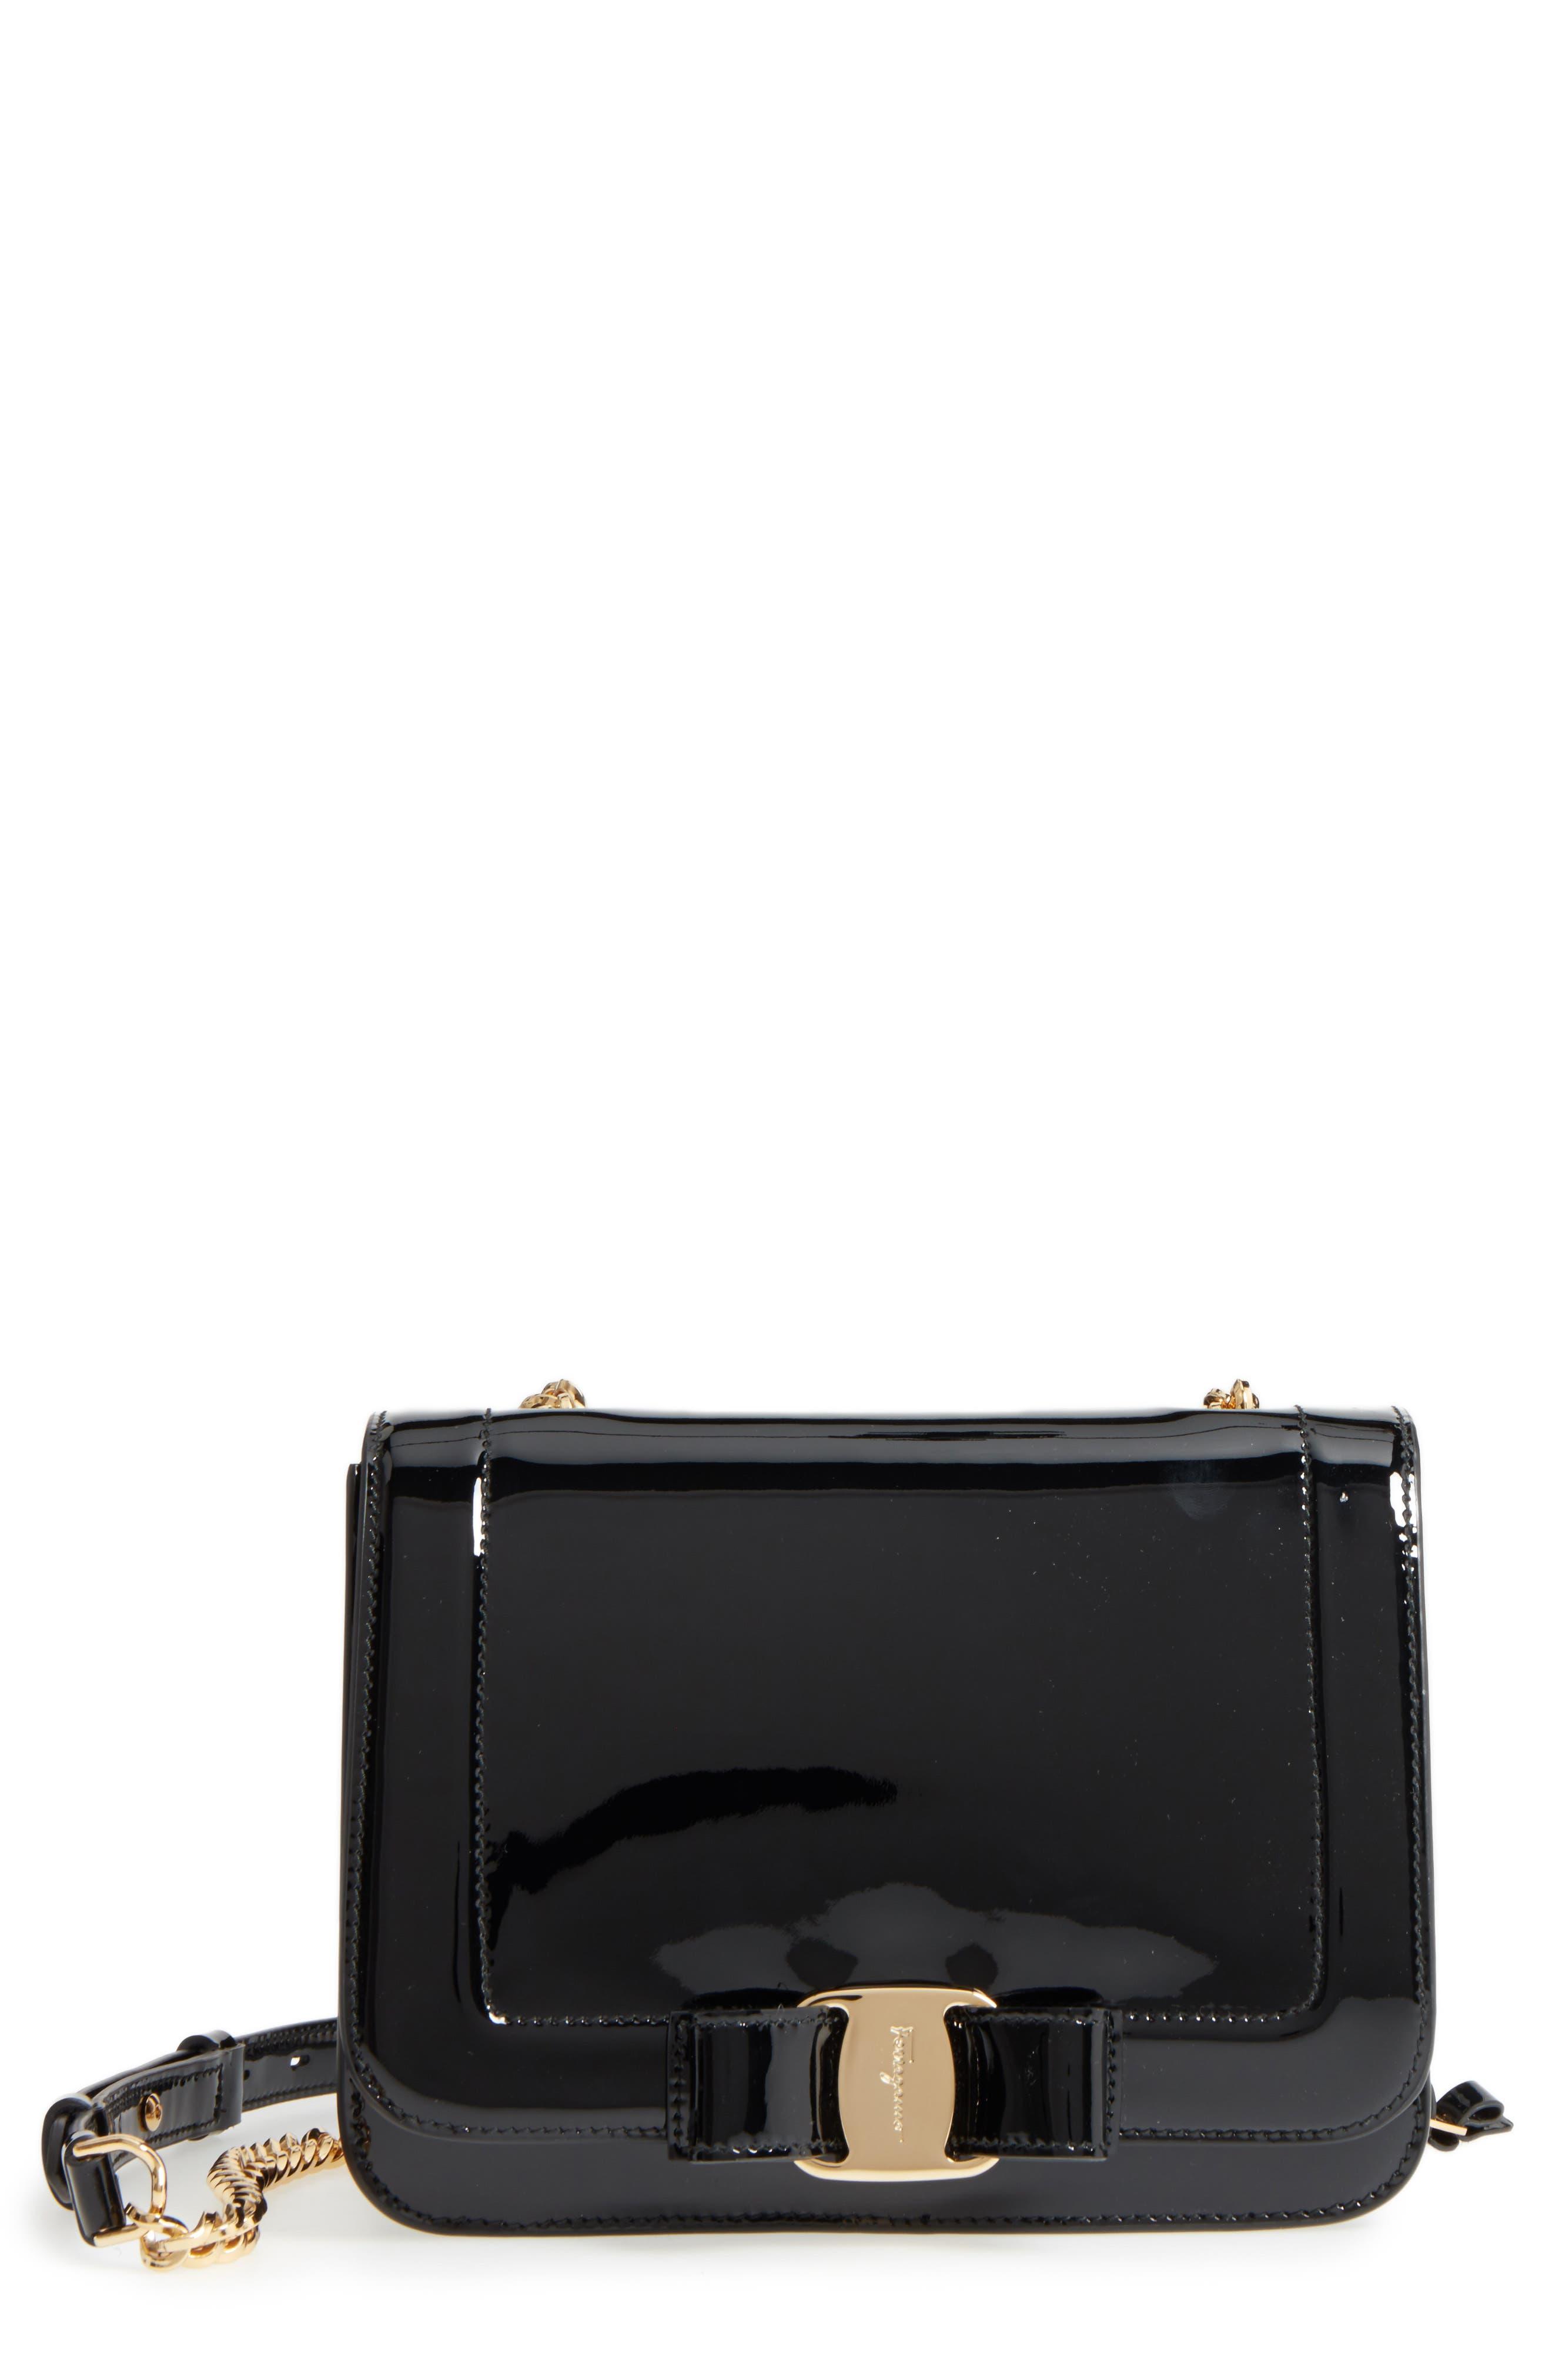 Vara Patent Leather Shoulder Bag,                             Main thumbnail 1, color,                             NERO/ BONBON